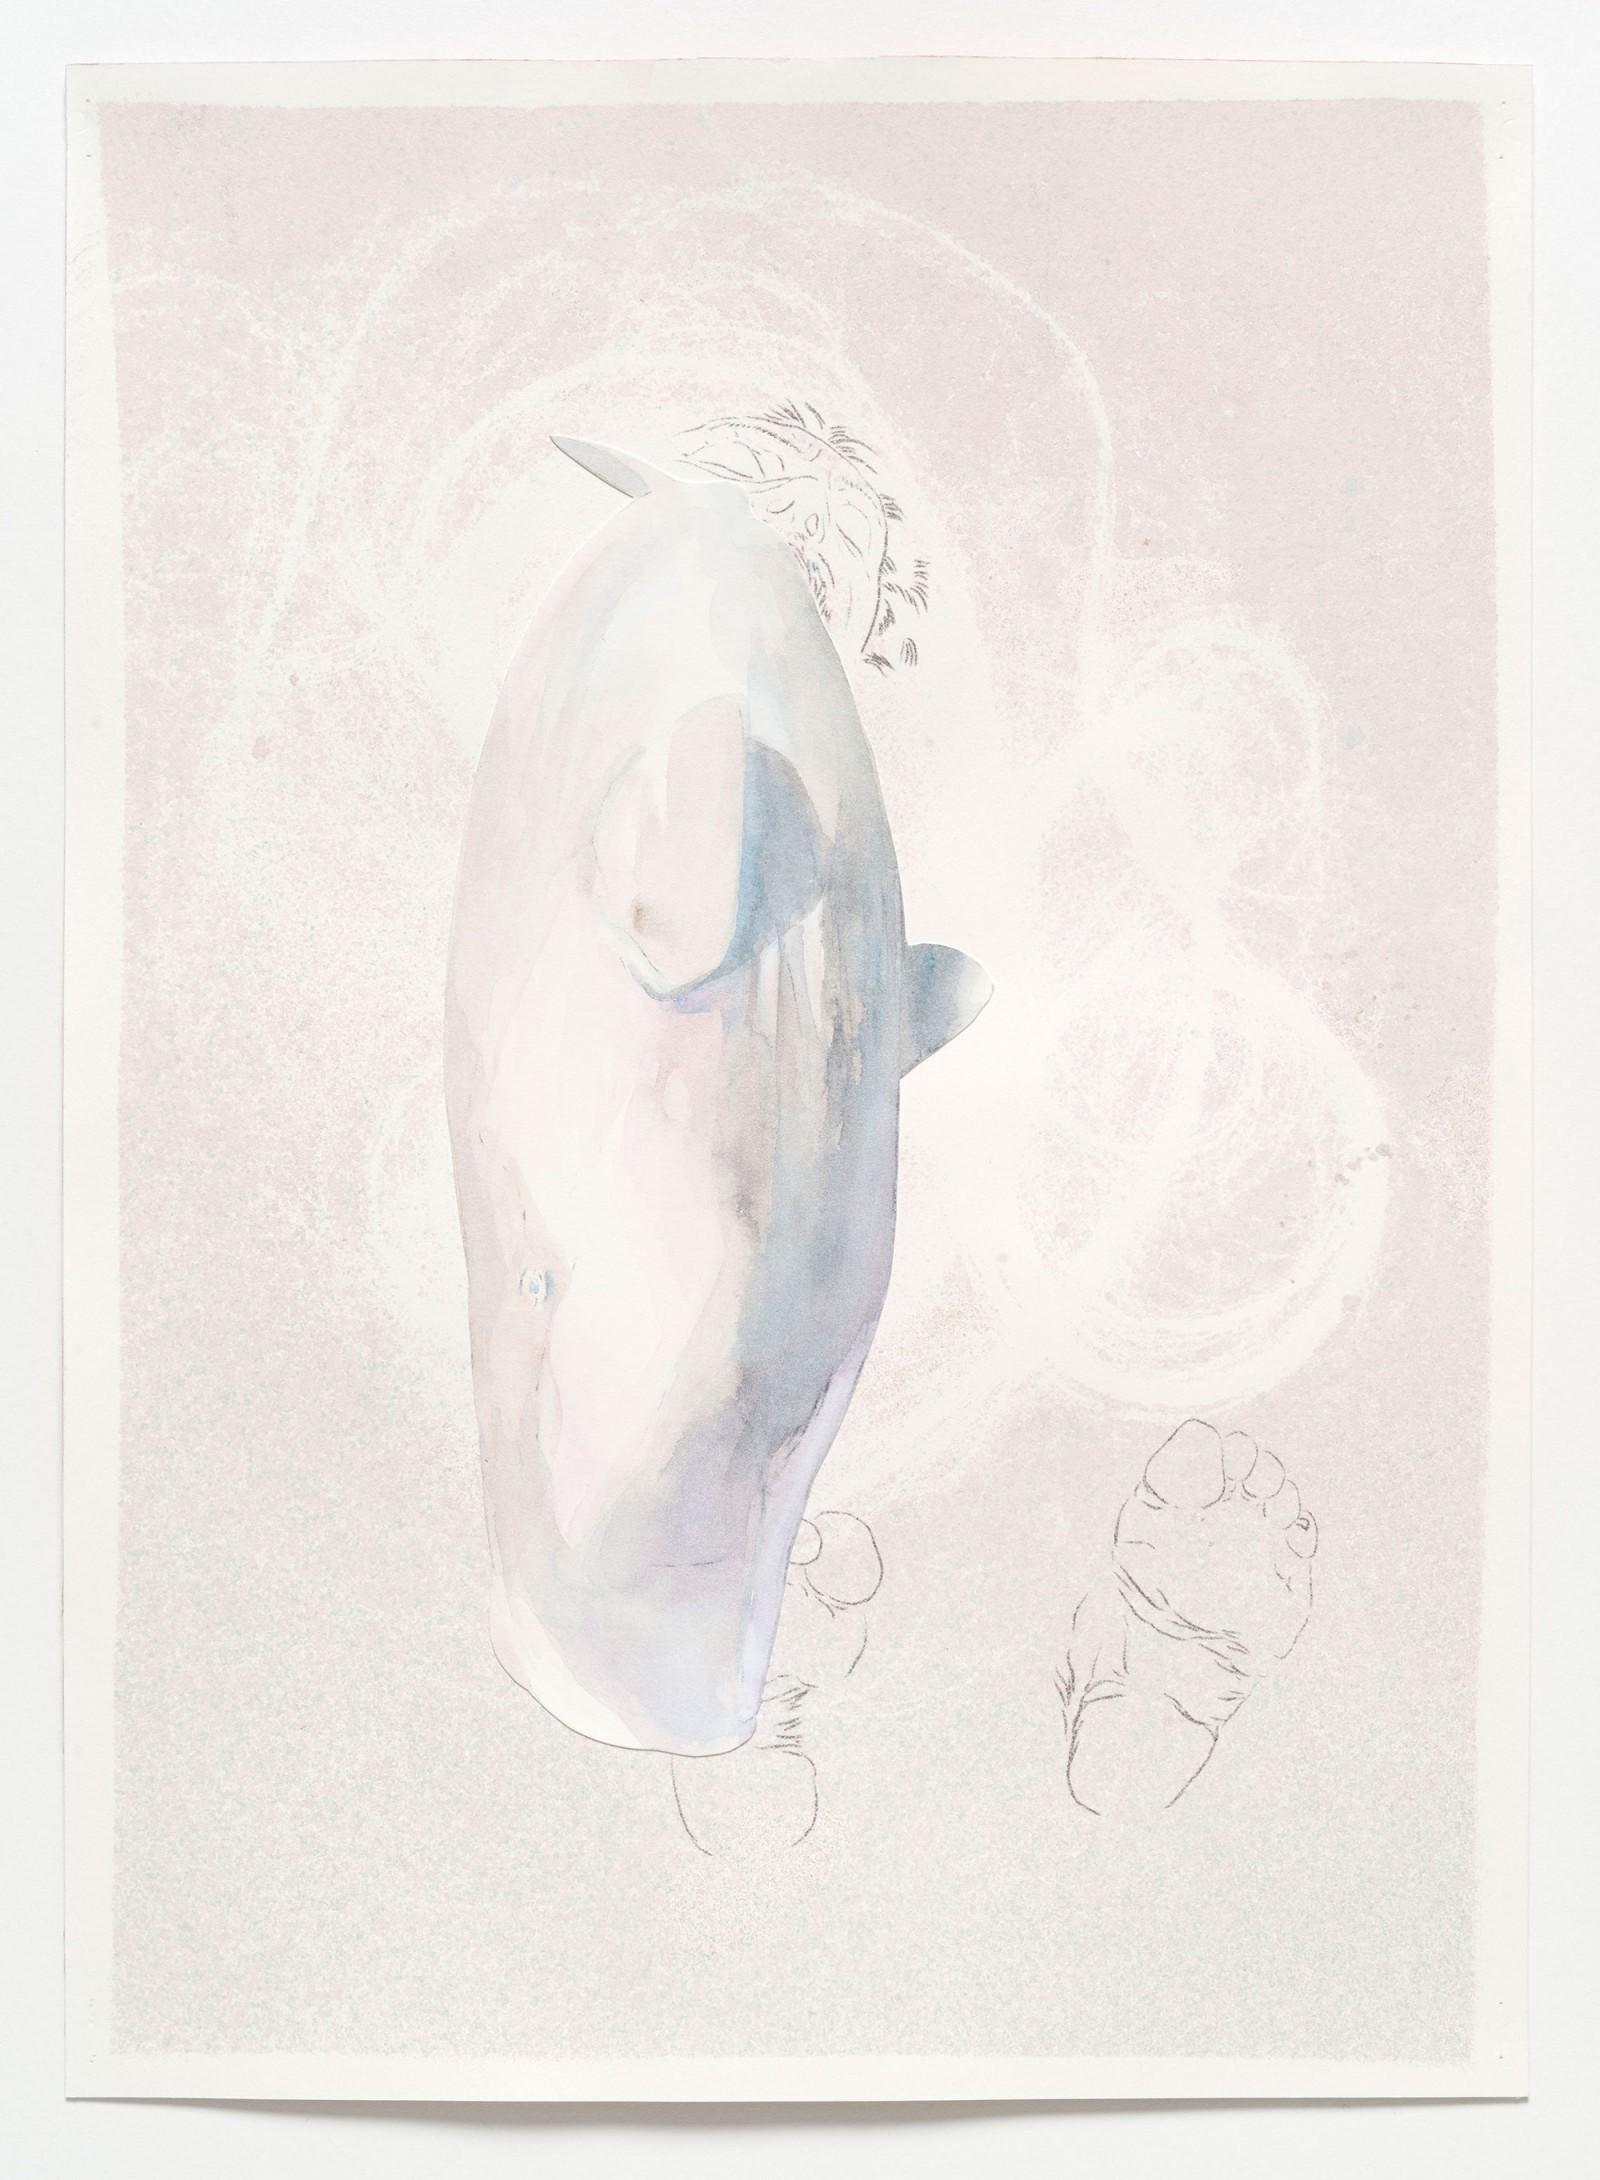 Kim Nekarda: untitled, 2019, carbon & watercolour on paper, 39 x 28 cm